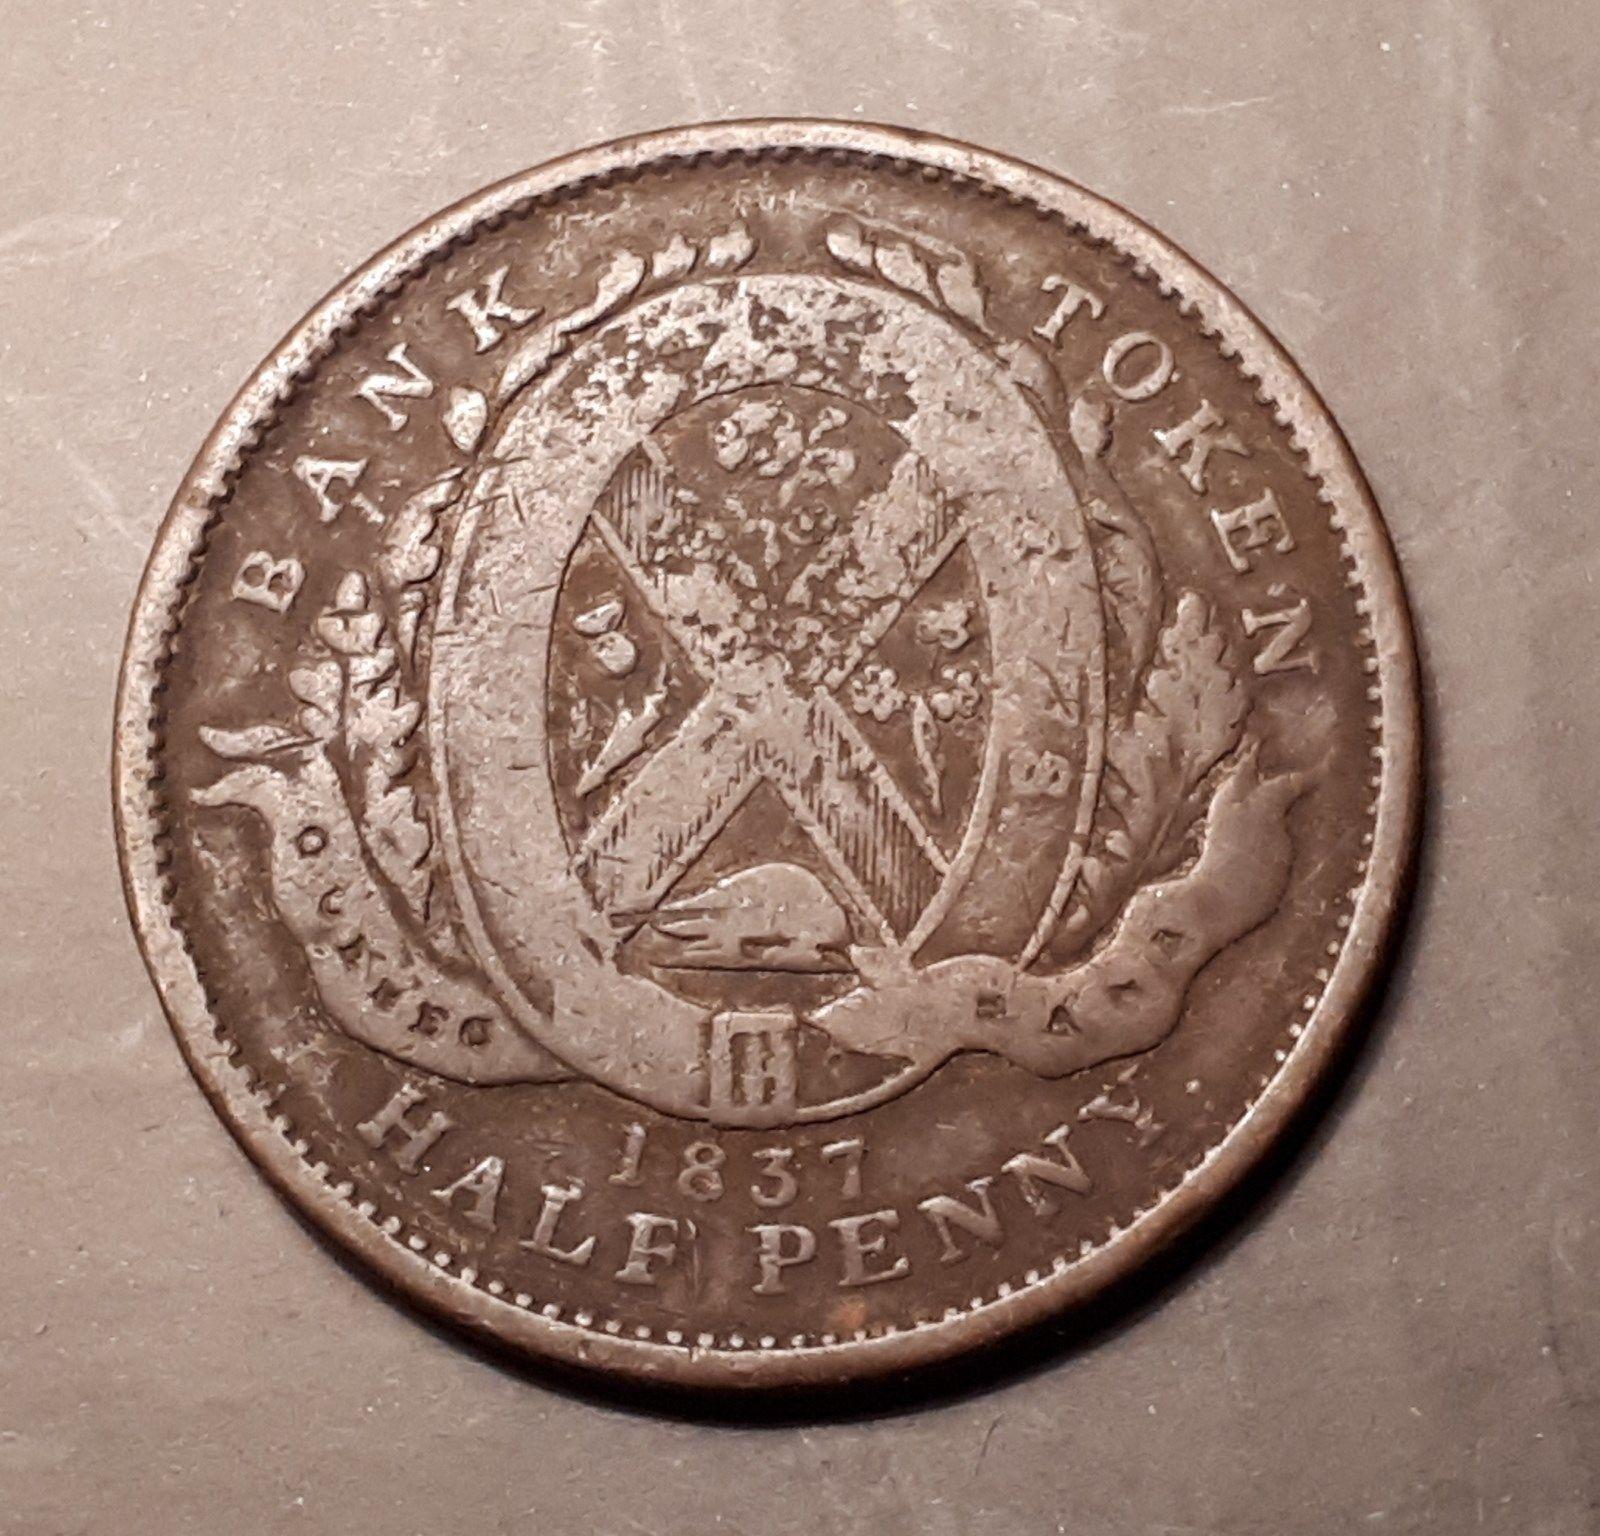 1837 Quebec Bank Old Canada Un Sou Half Penny Bank Token 181 Years Old Coins Paper Money Coins Canada Tokens 1820 1860 Ebay